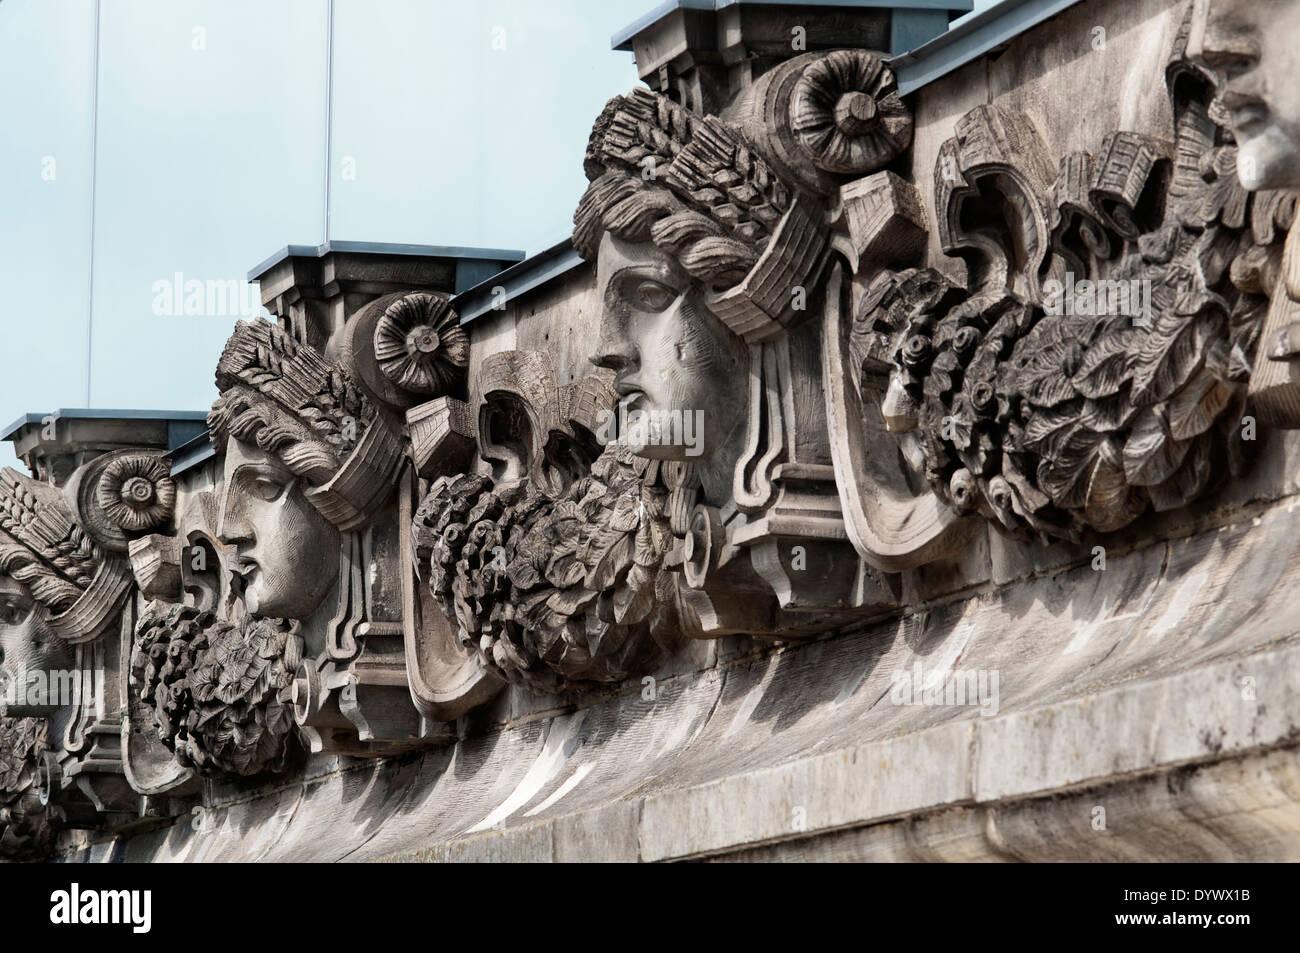 Germany, Berlin, Bundestag, German Parliament Building, Reichstag - Stock Image